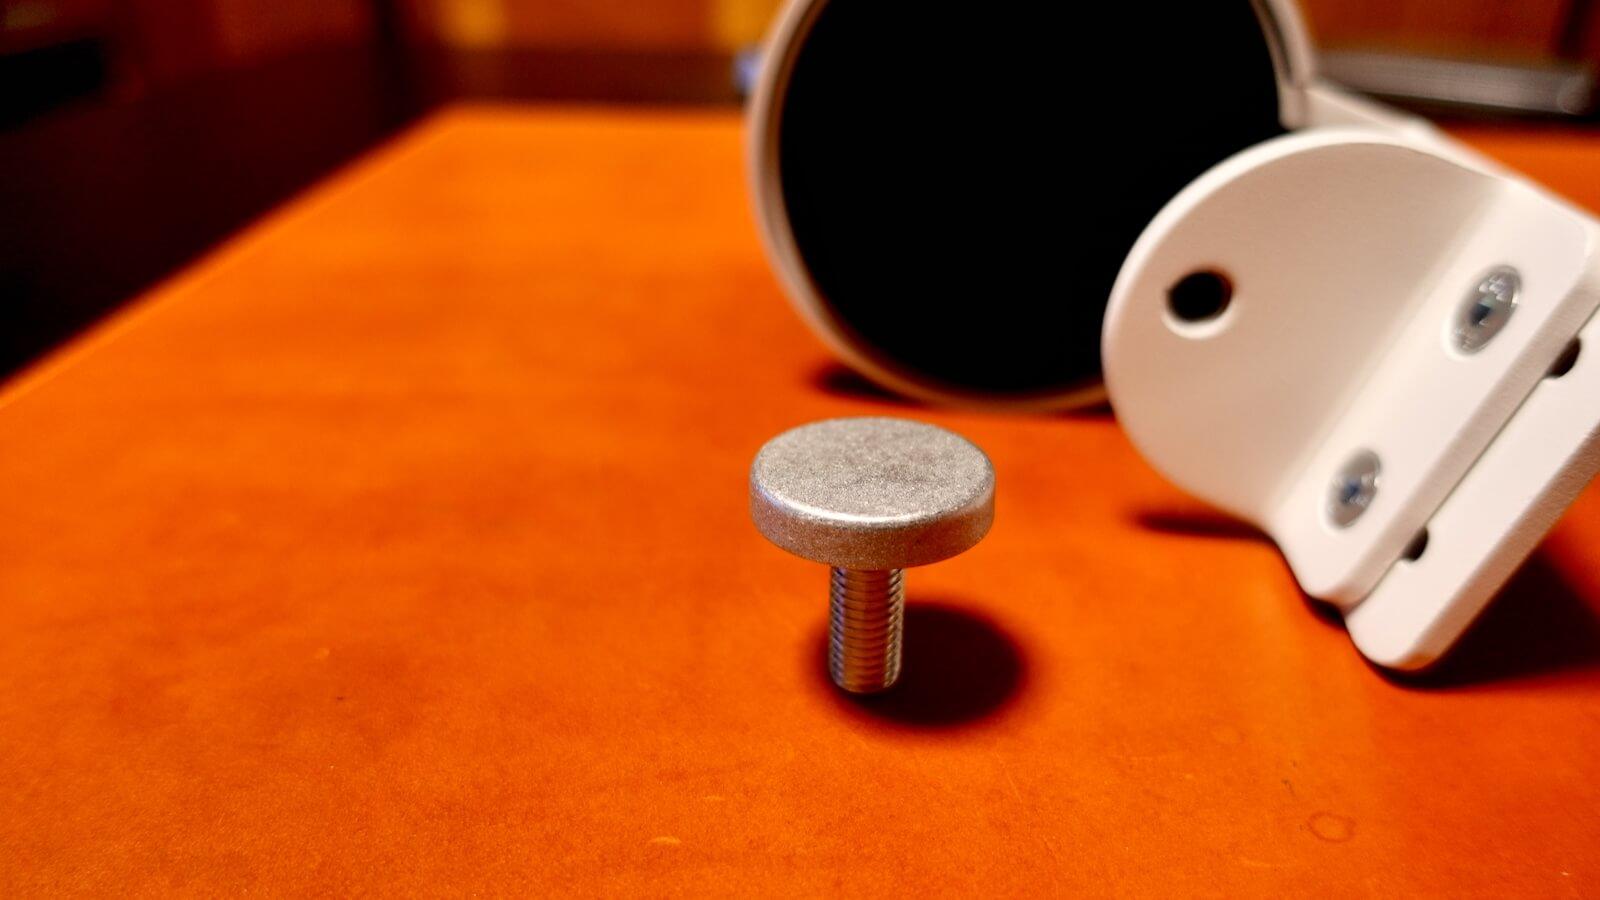 HermanMiller FLO Monitor Arm Desk Clamp Parts